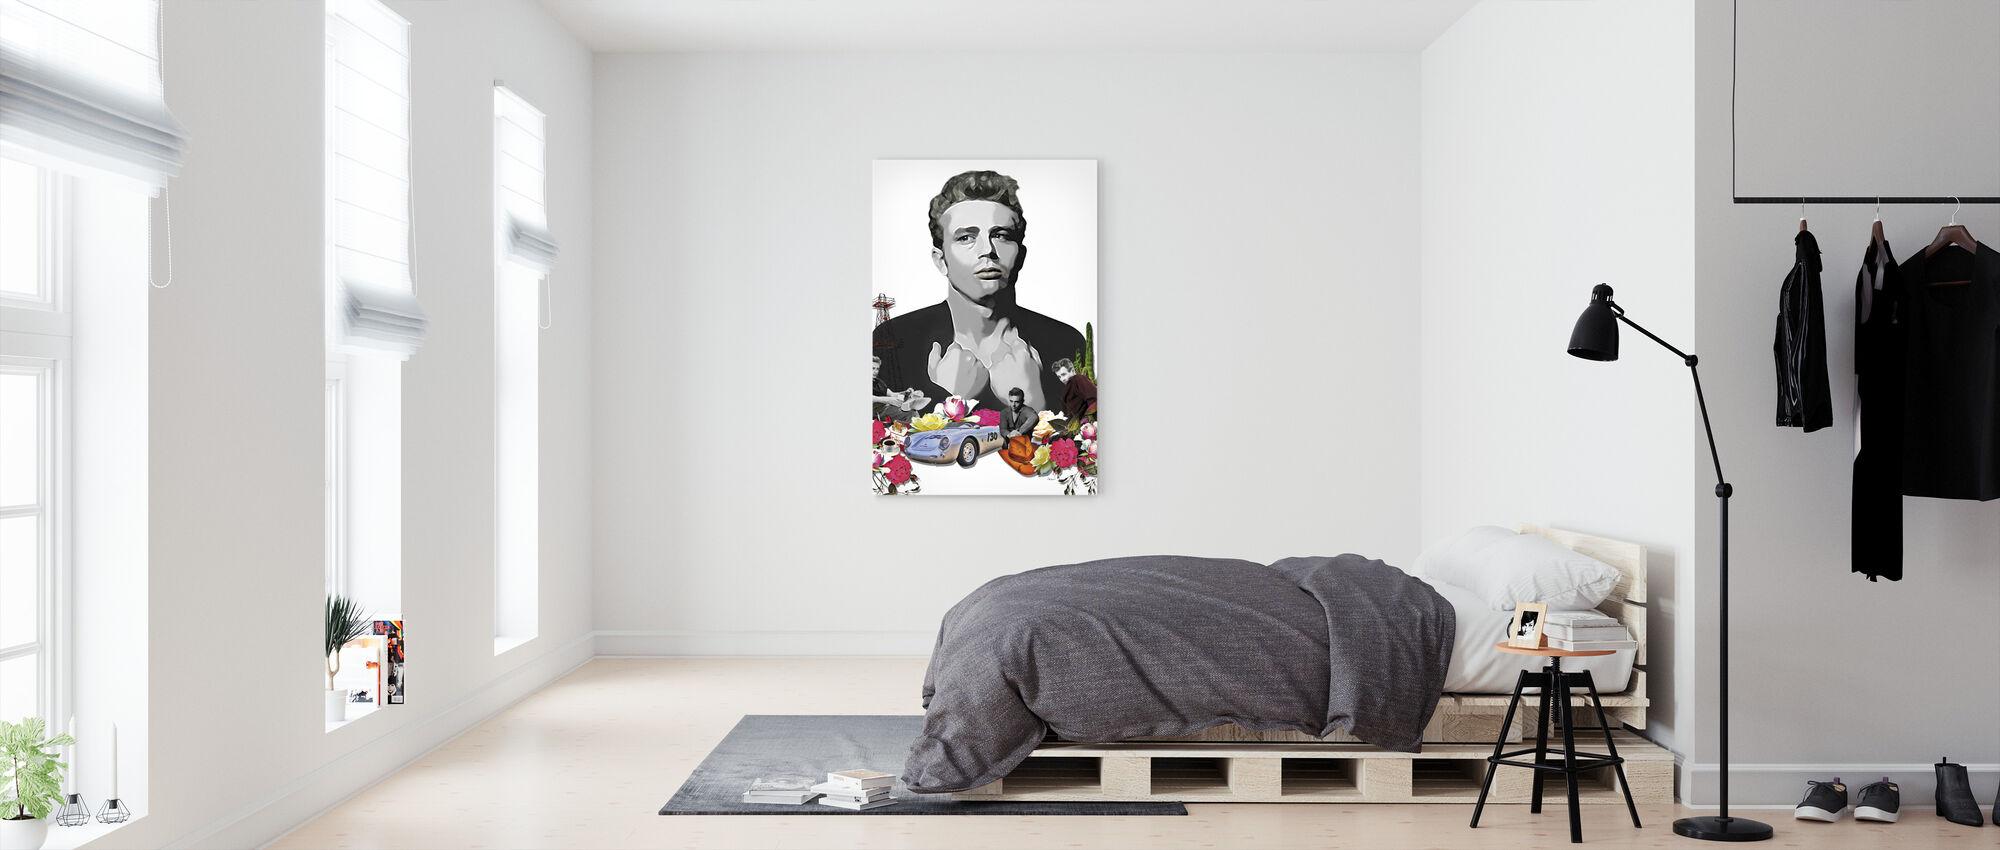 Dean - White - Canvas print - Bedroom